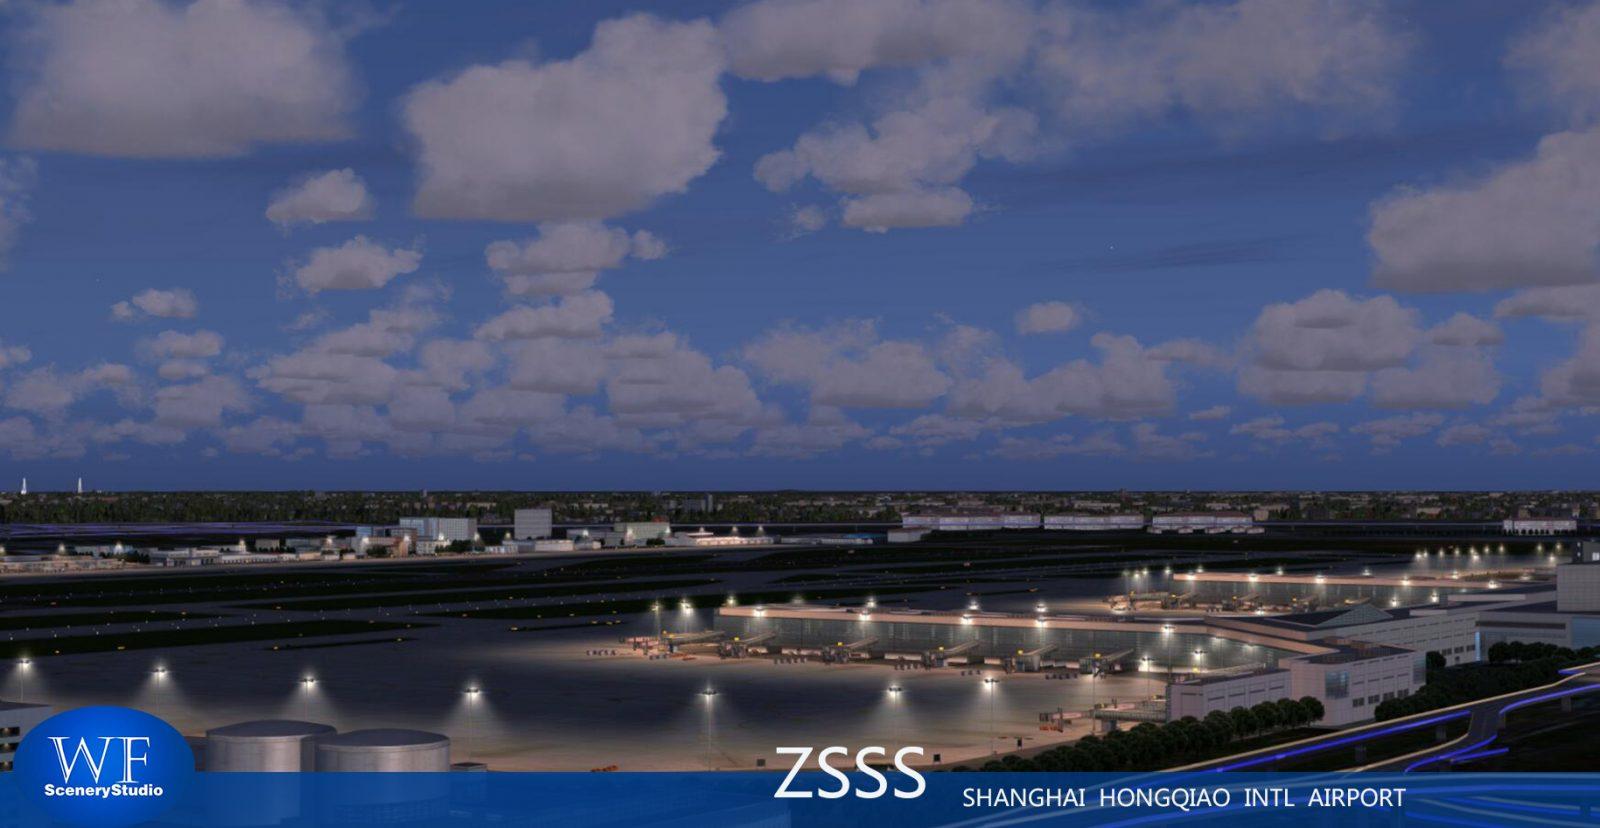 Shanghai Hongqiao International For P3dv4 Released